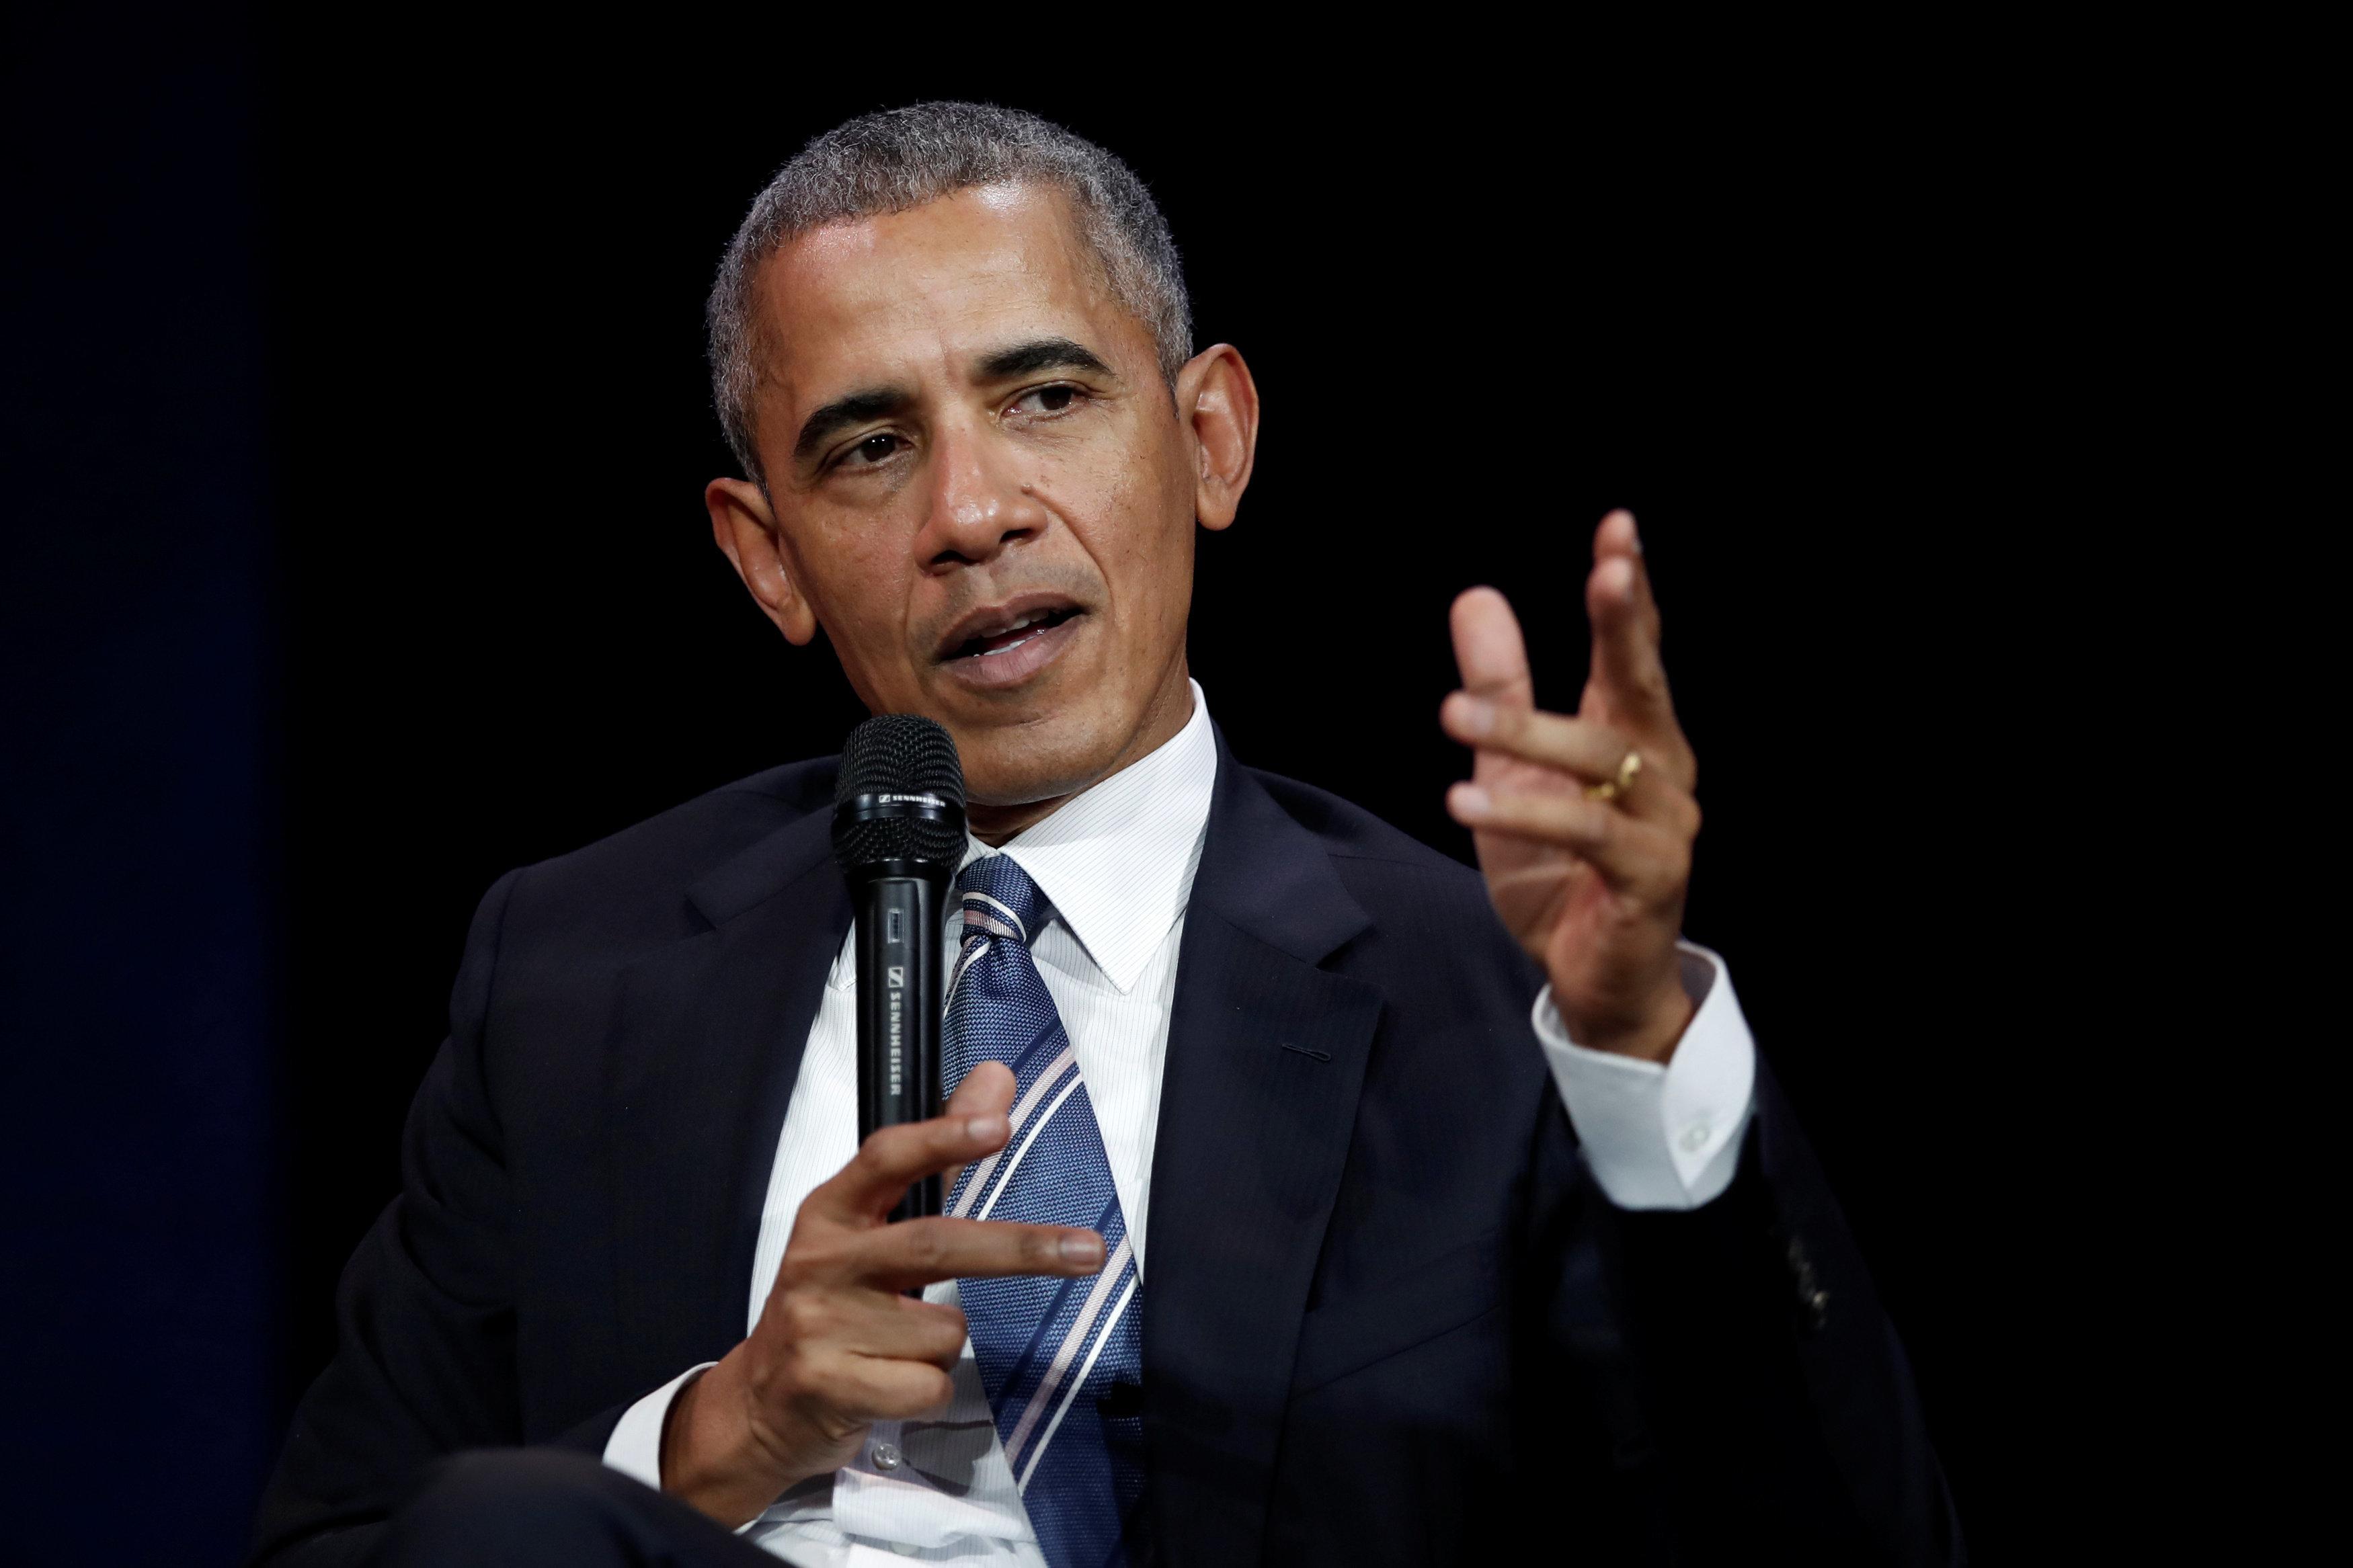 USA - Obama übt scharfe Kritik an Trump und Republikanern